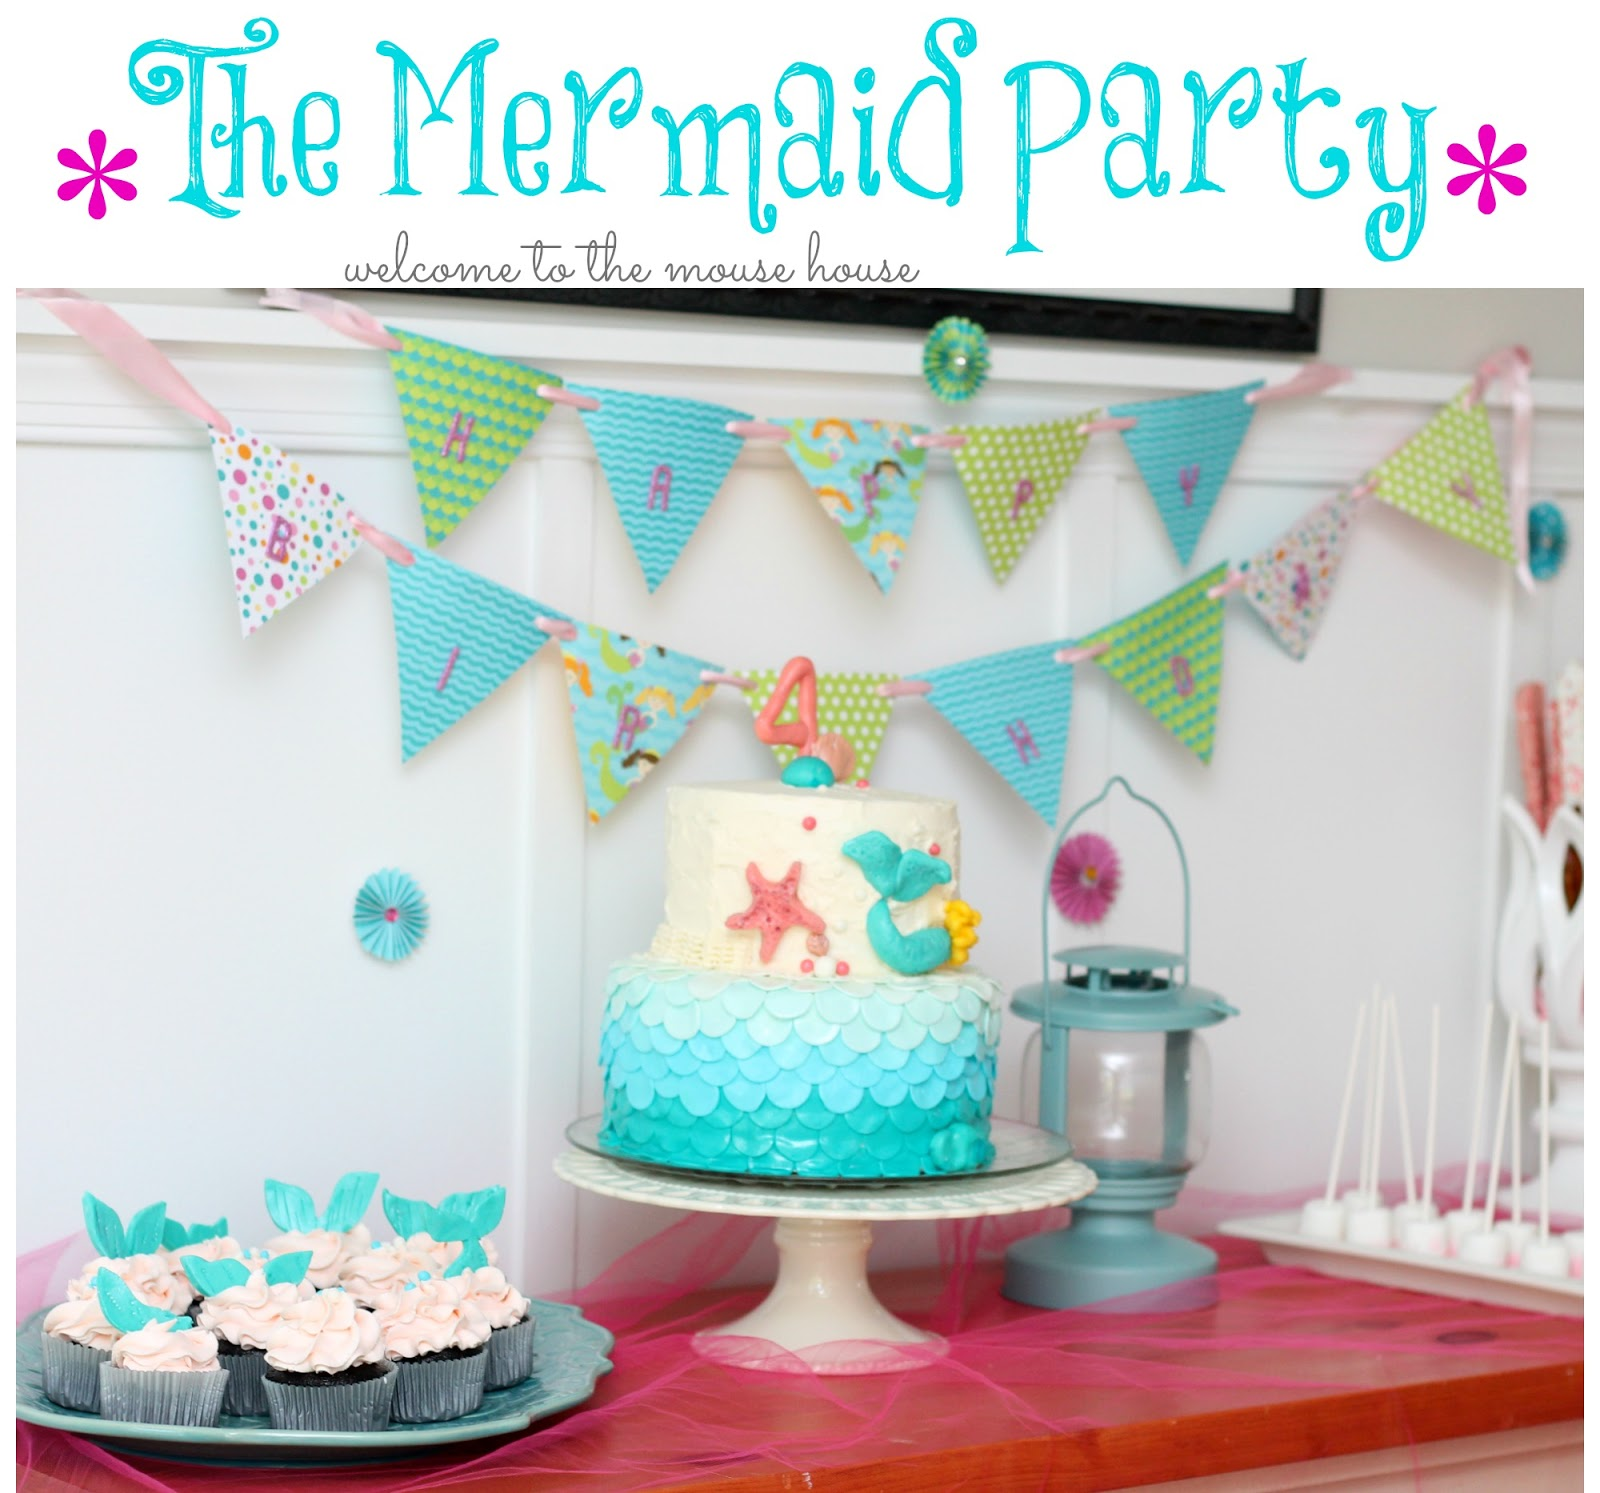 The Mermaid Birthday Party